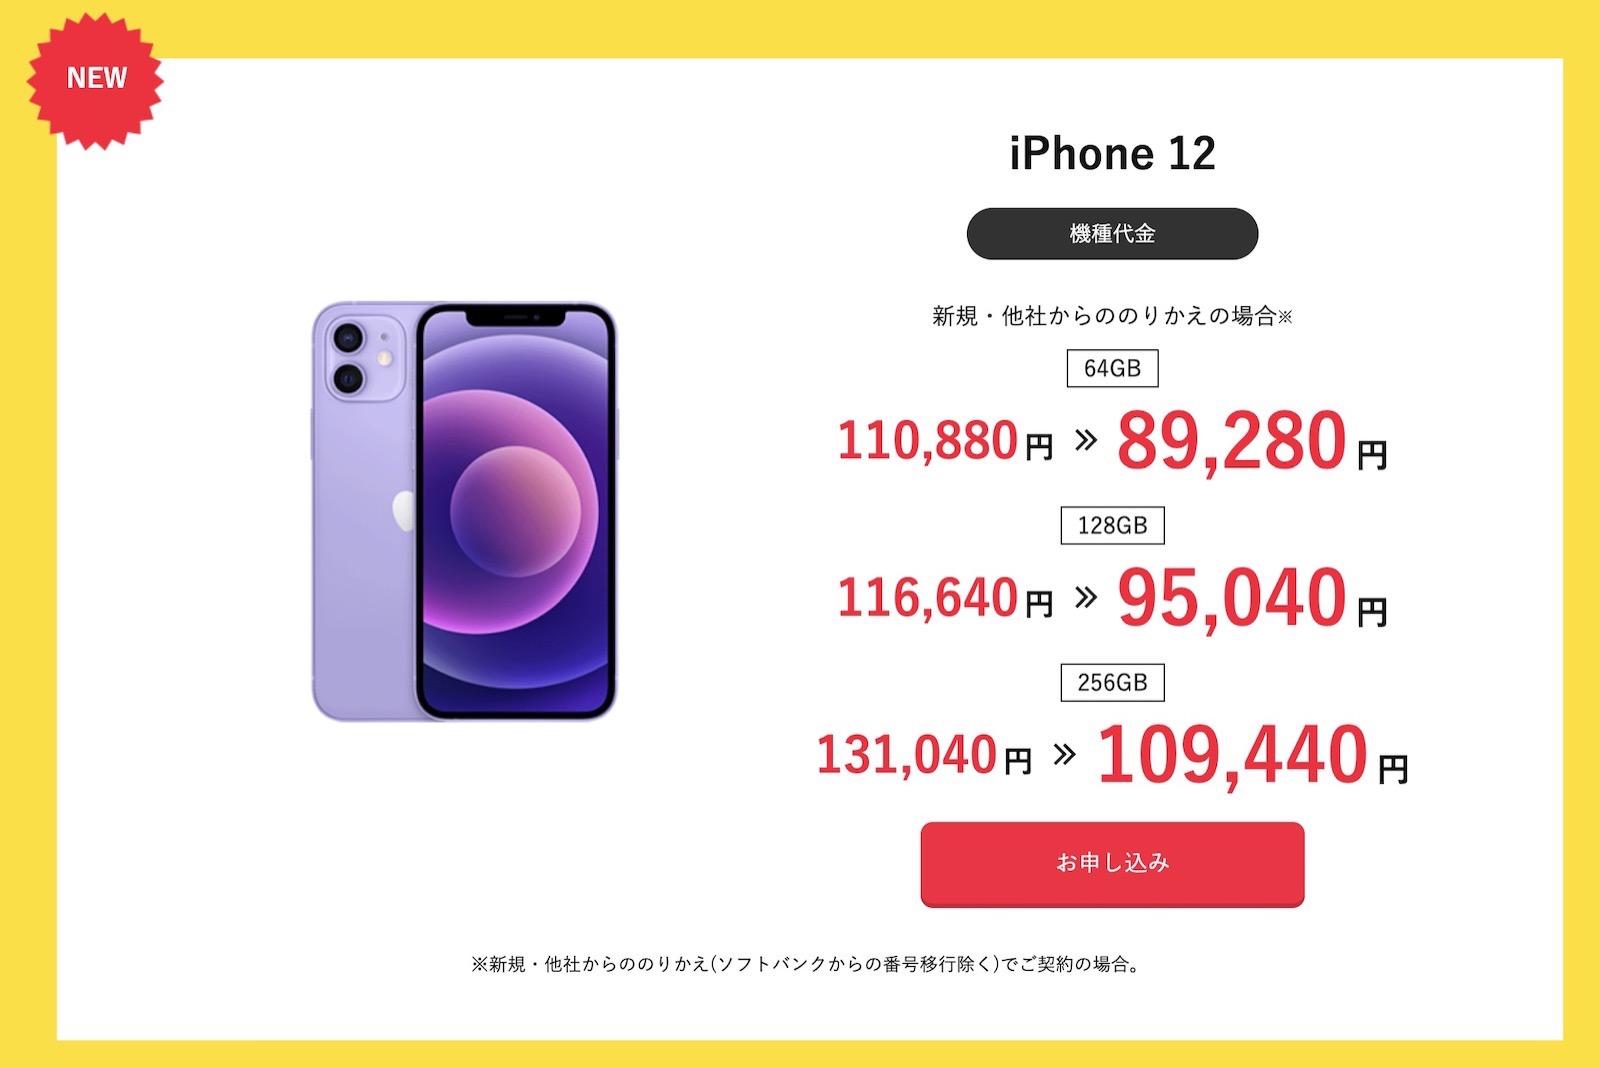 Iphone12 ymobile on sale